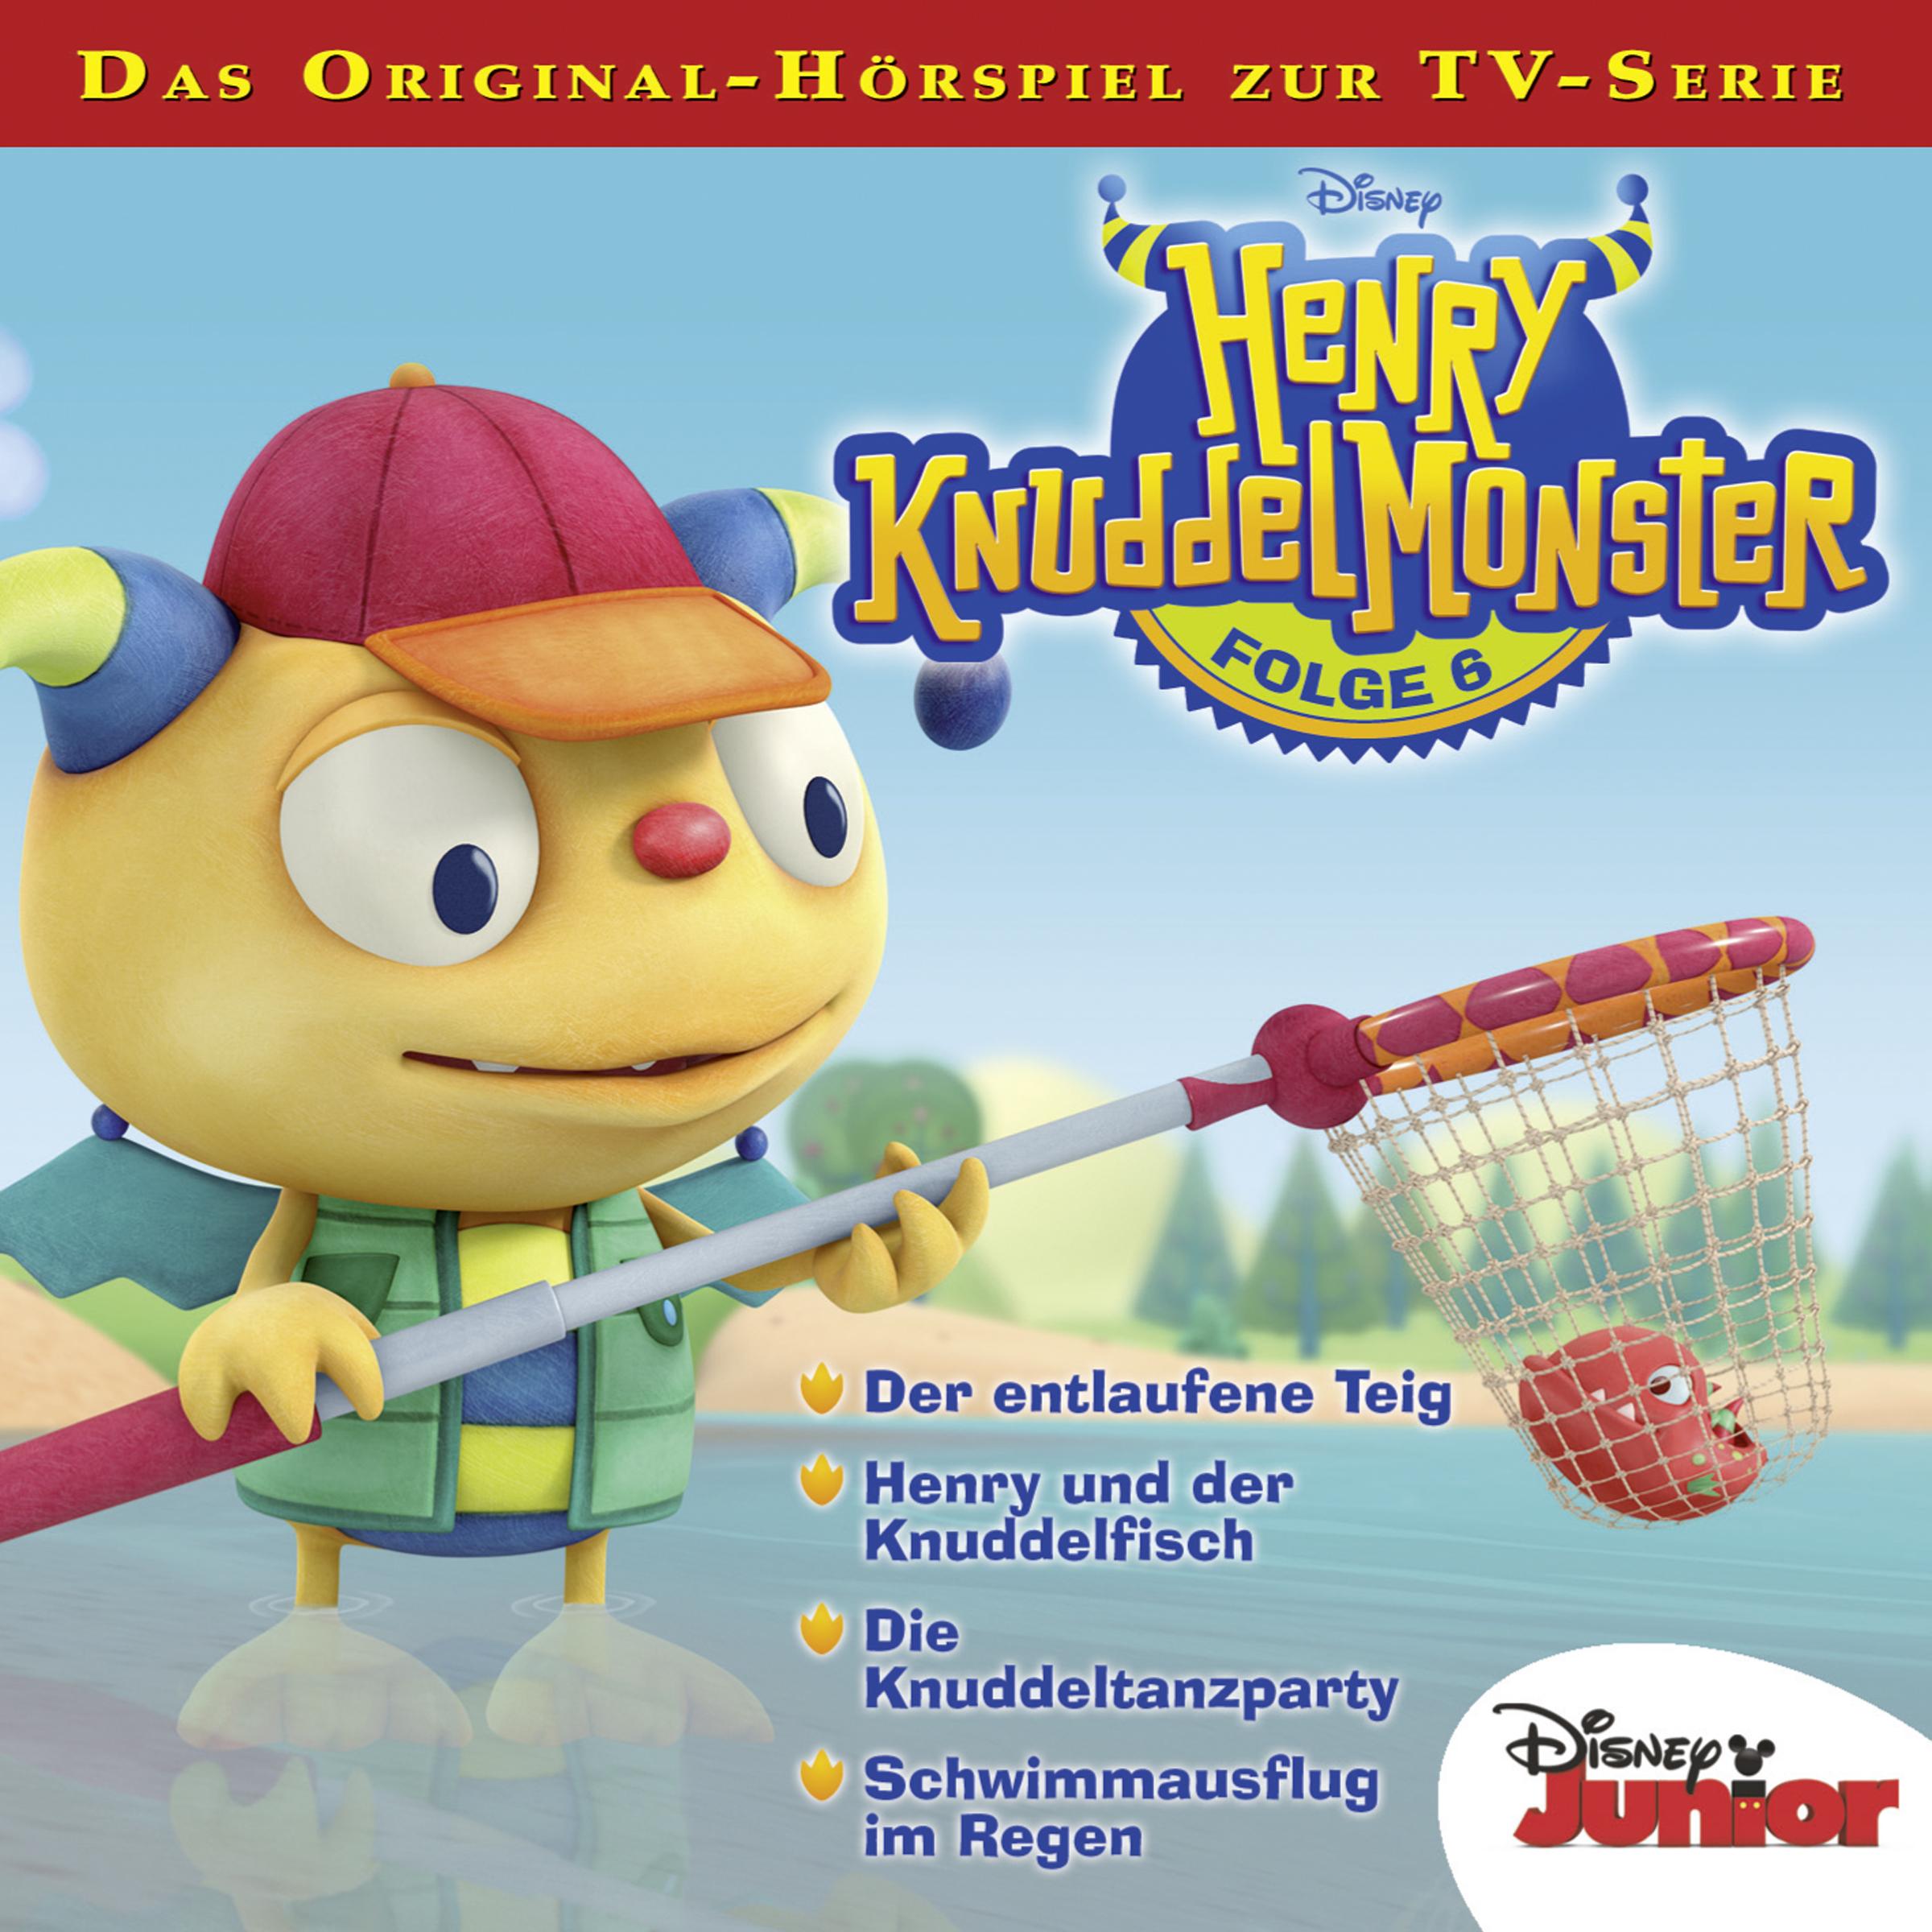 Disney: Henry Knuddelmonster (Folge 6) MP3-Download